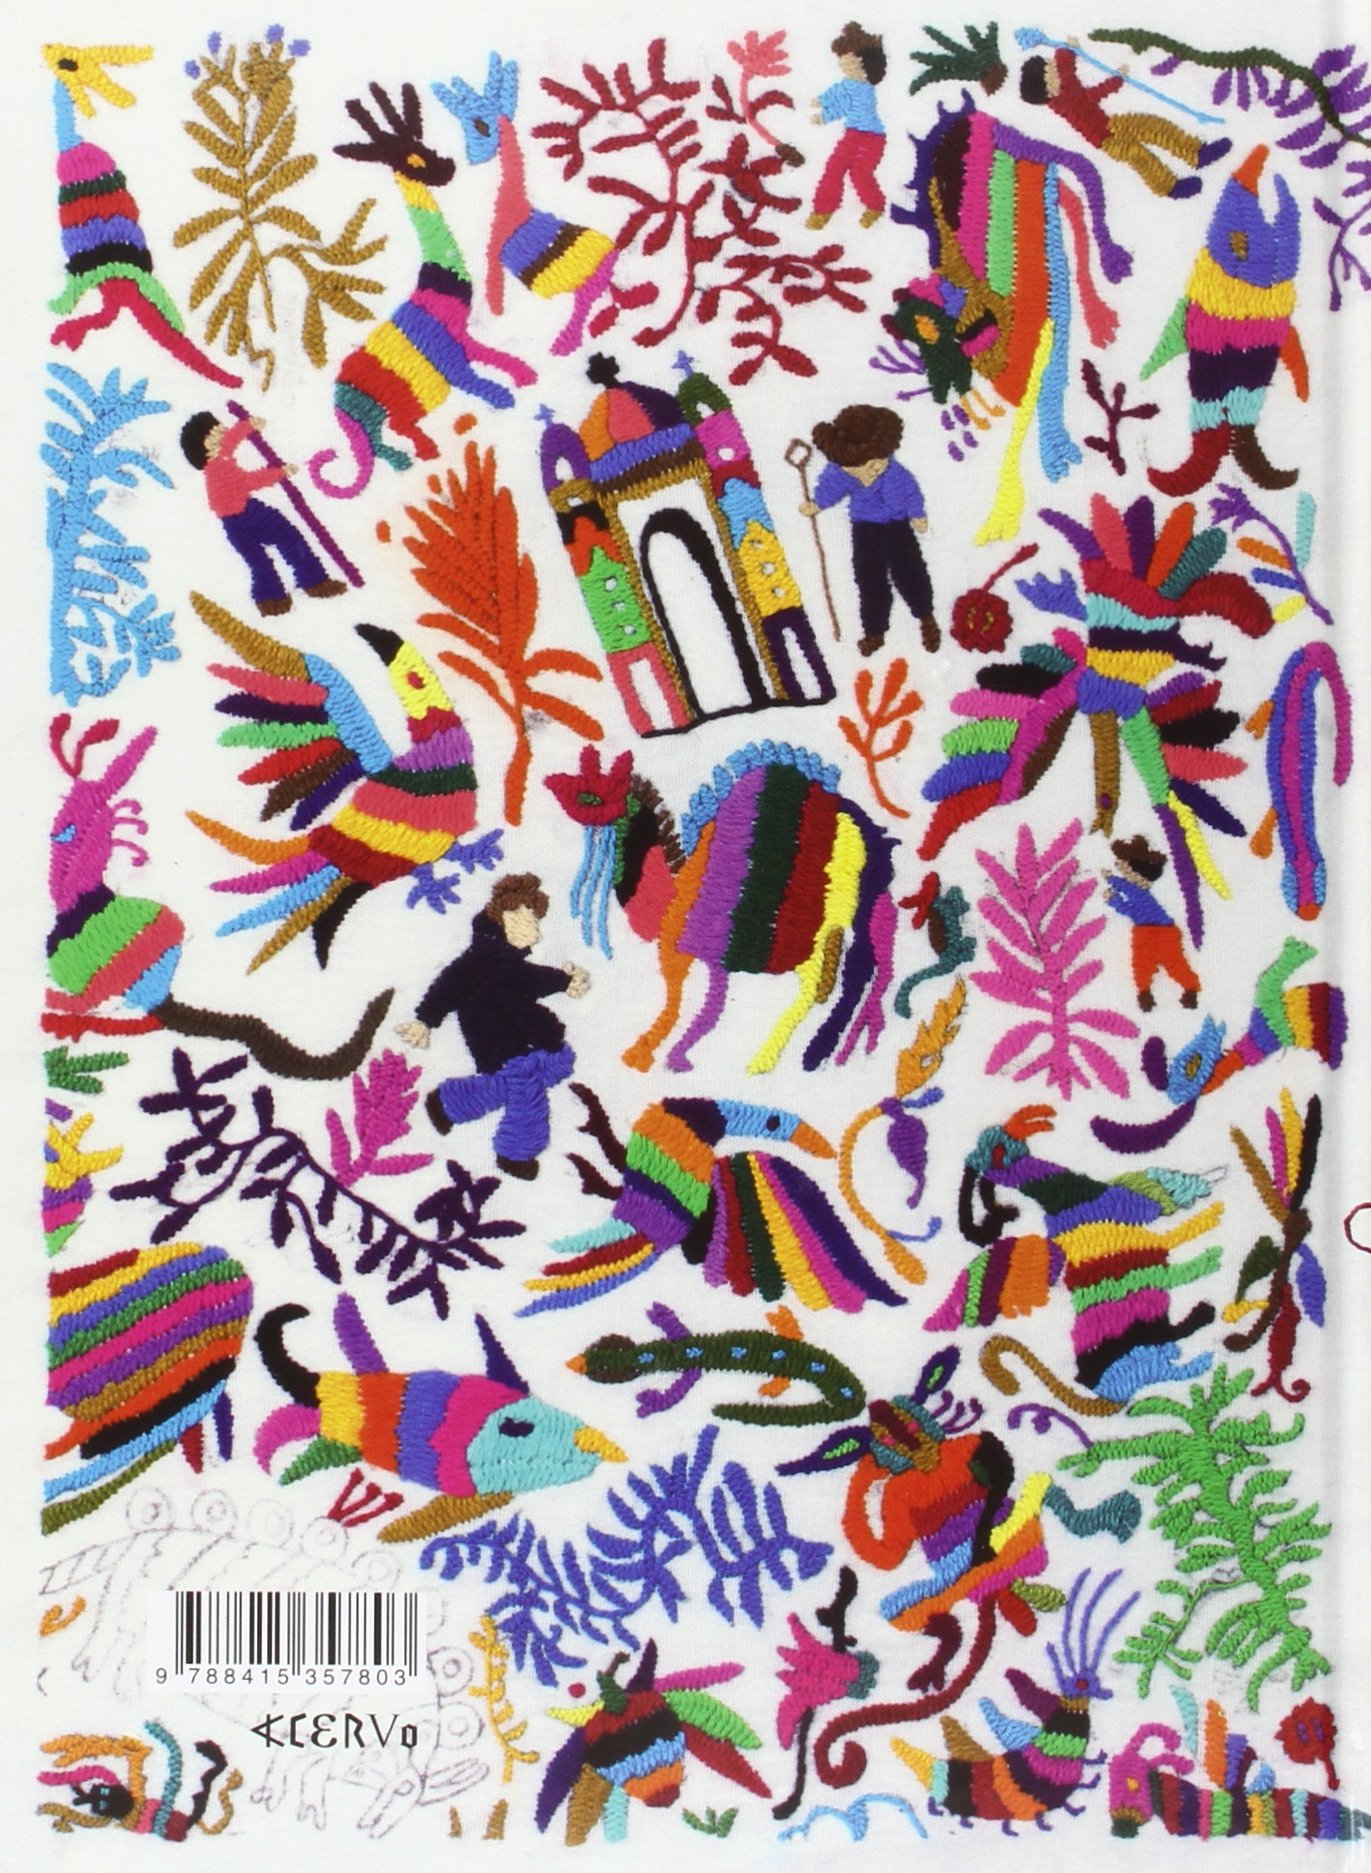 Camino A Tenango (Acervo): Amazon.es: Gimena Romero Rodríguez: Libros